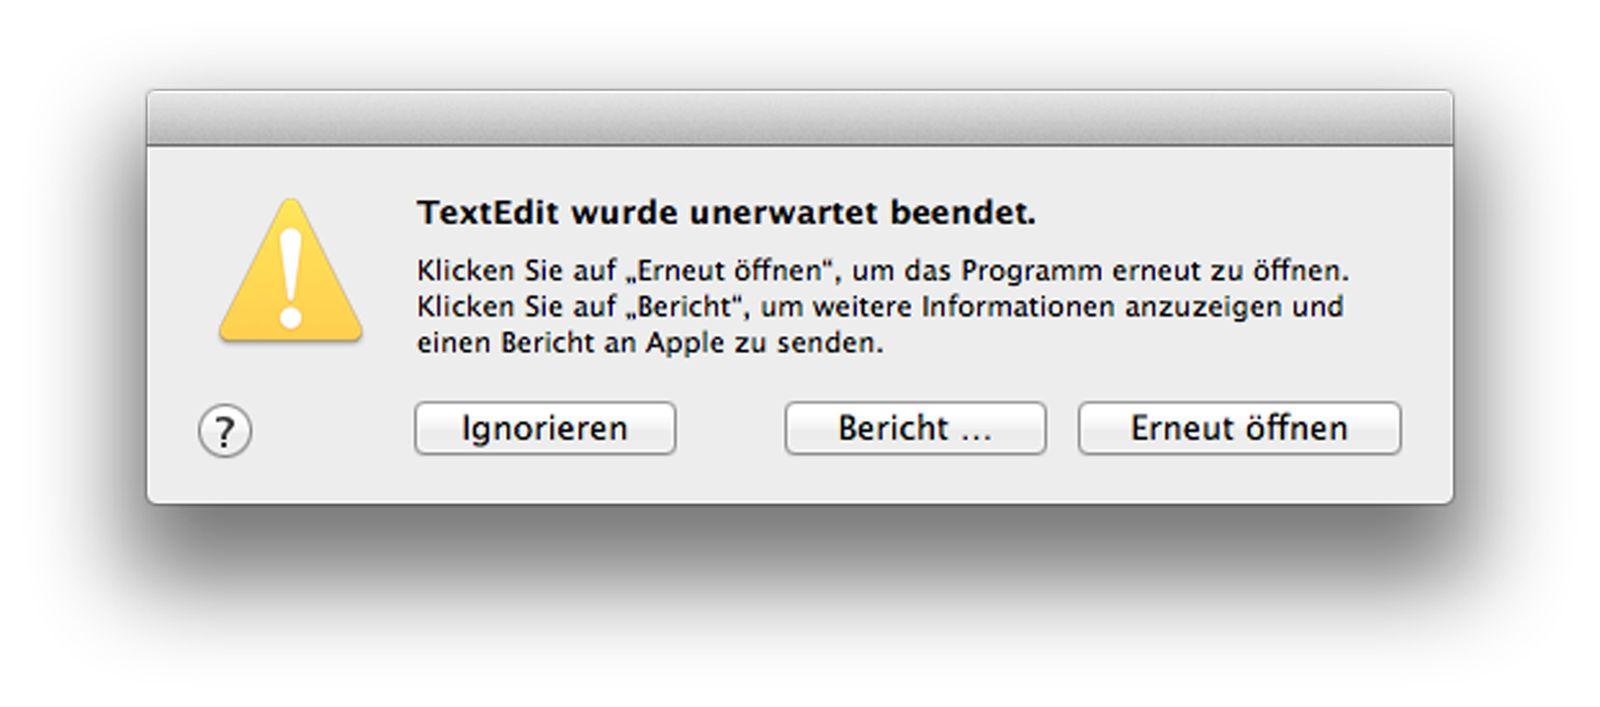 Absturz TextEdit/ Fehlermeldung/ Screenshot